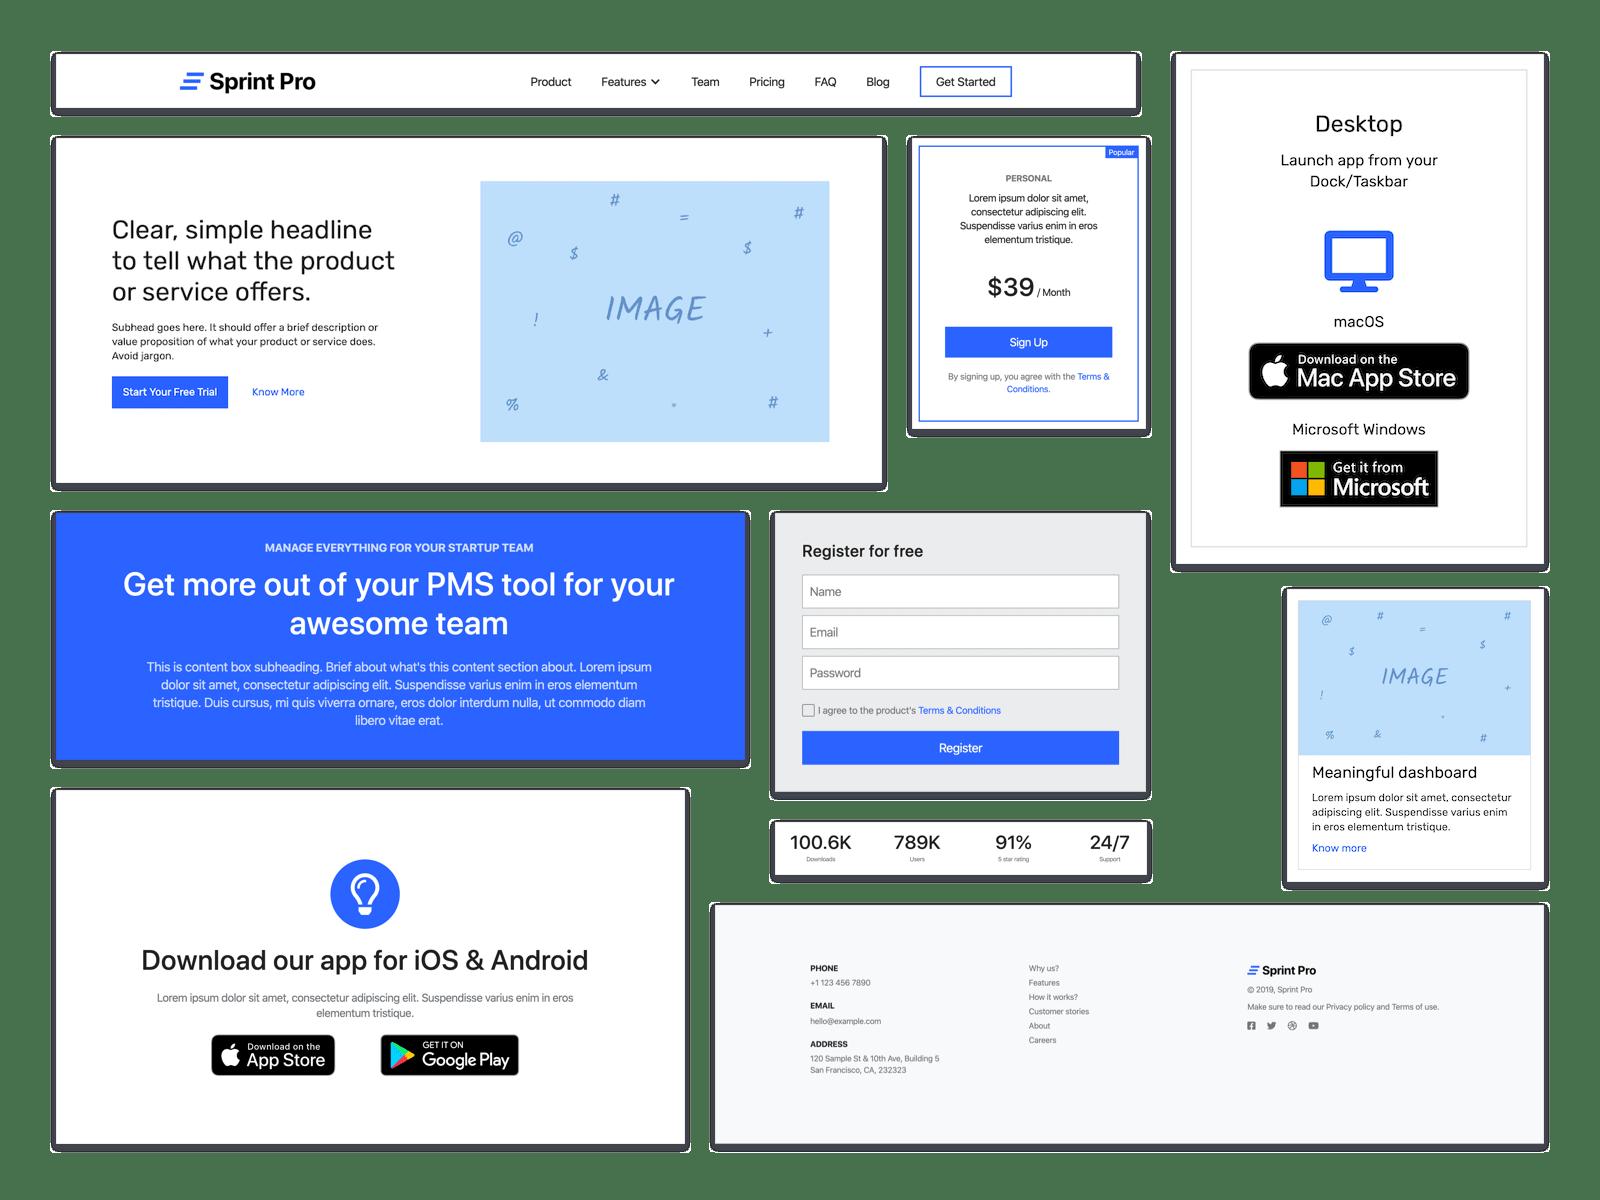 Sprint Pro UI blocks